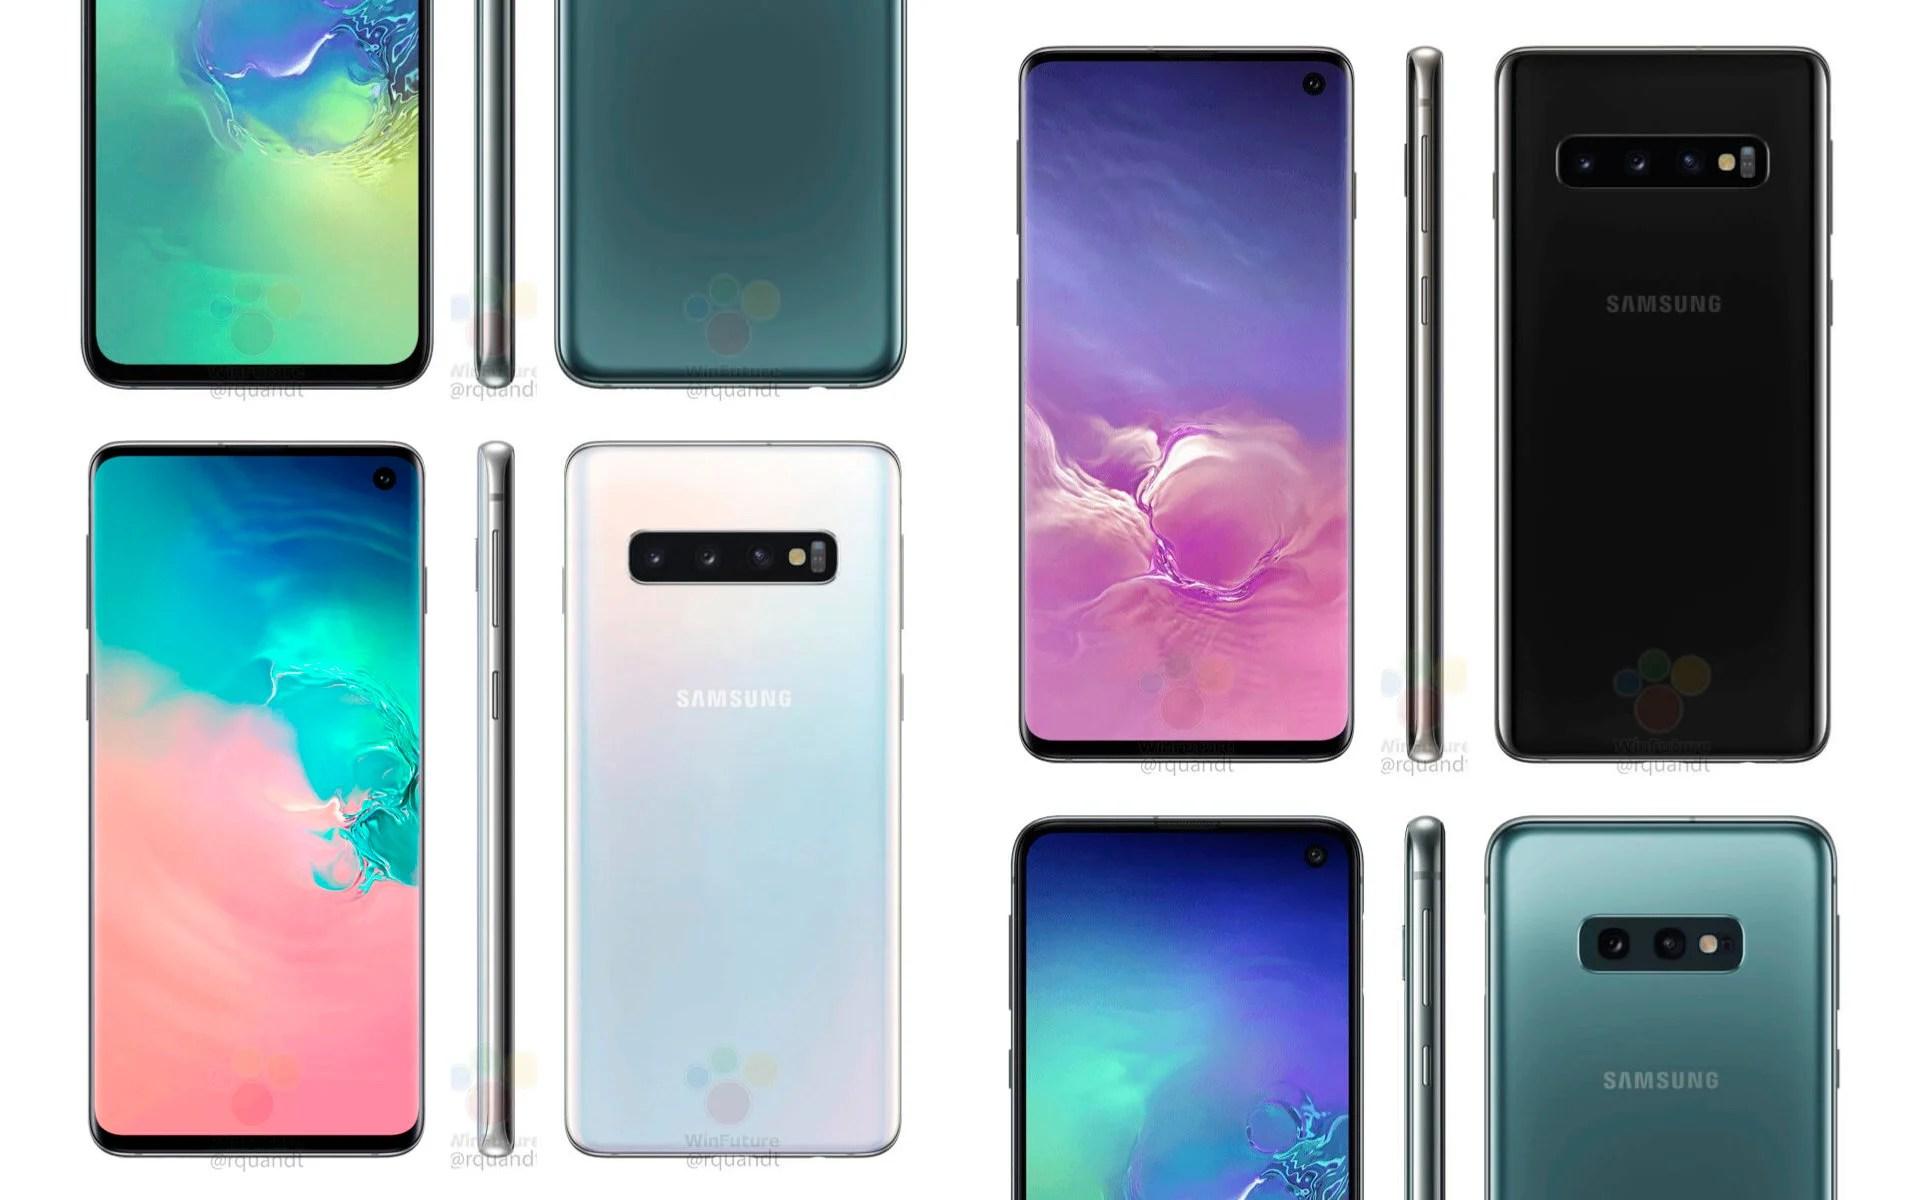 Samsung Galaxy S10 : HDR10+, mode ralenti 1080p et super stabilisation seraient au programme